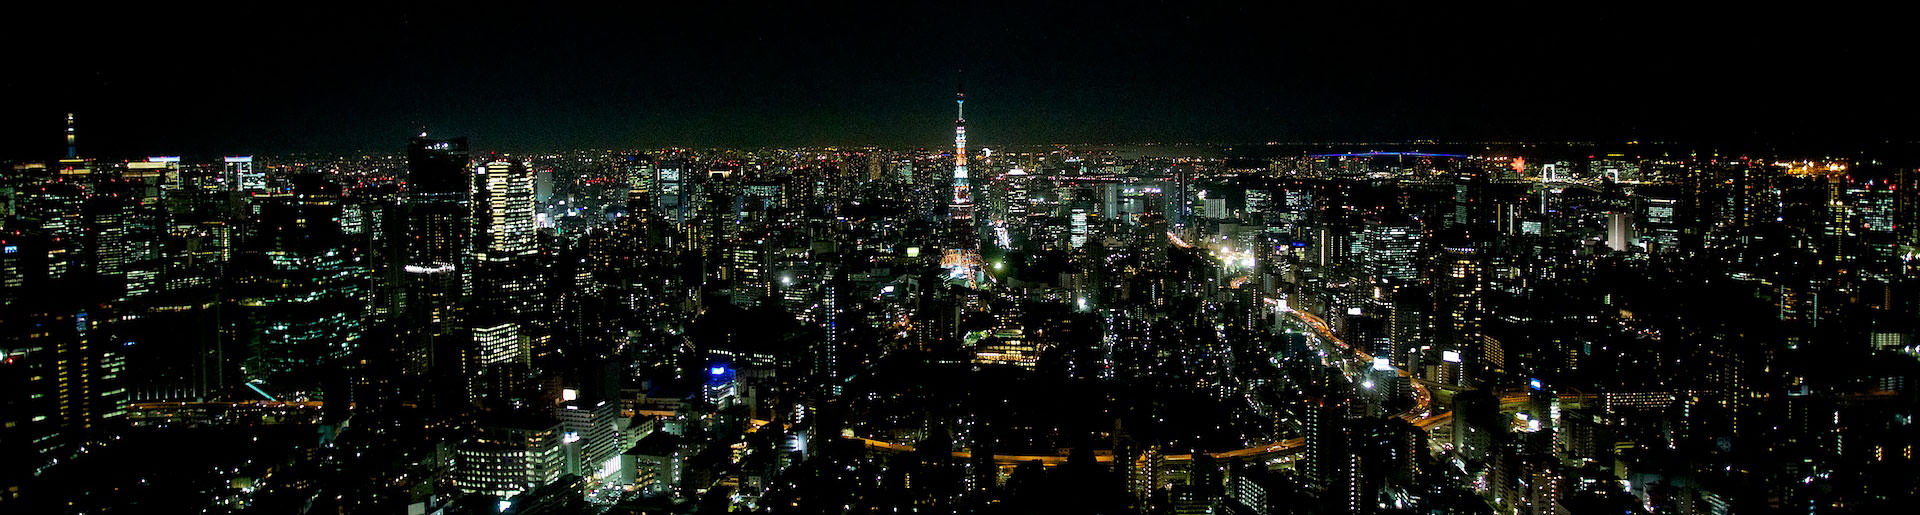 tokyo_city_view